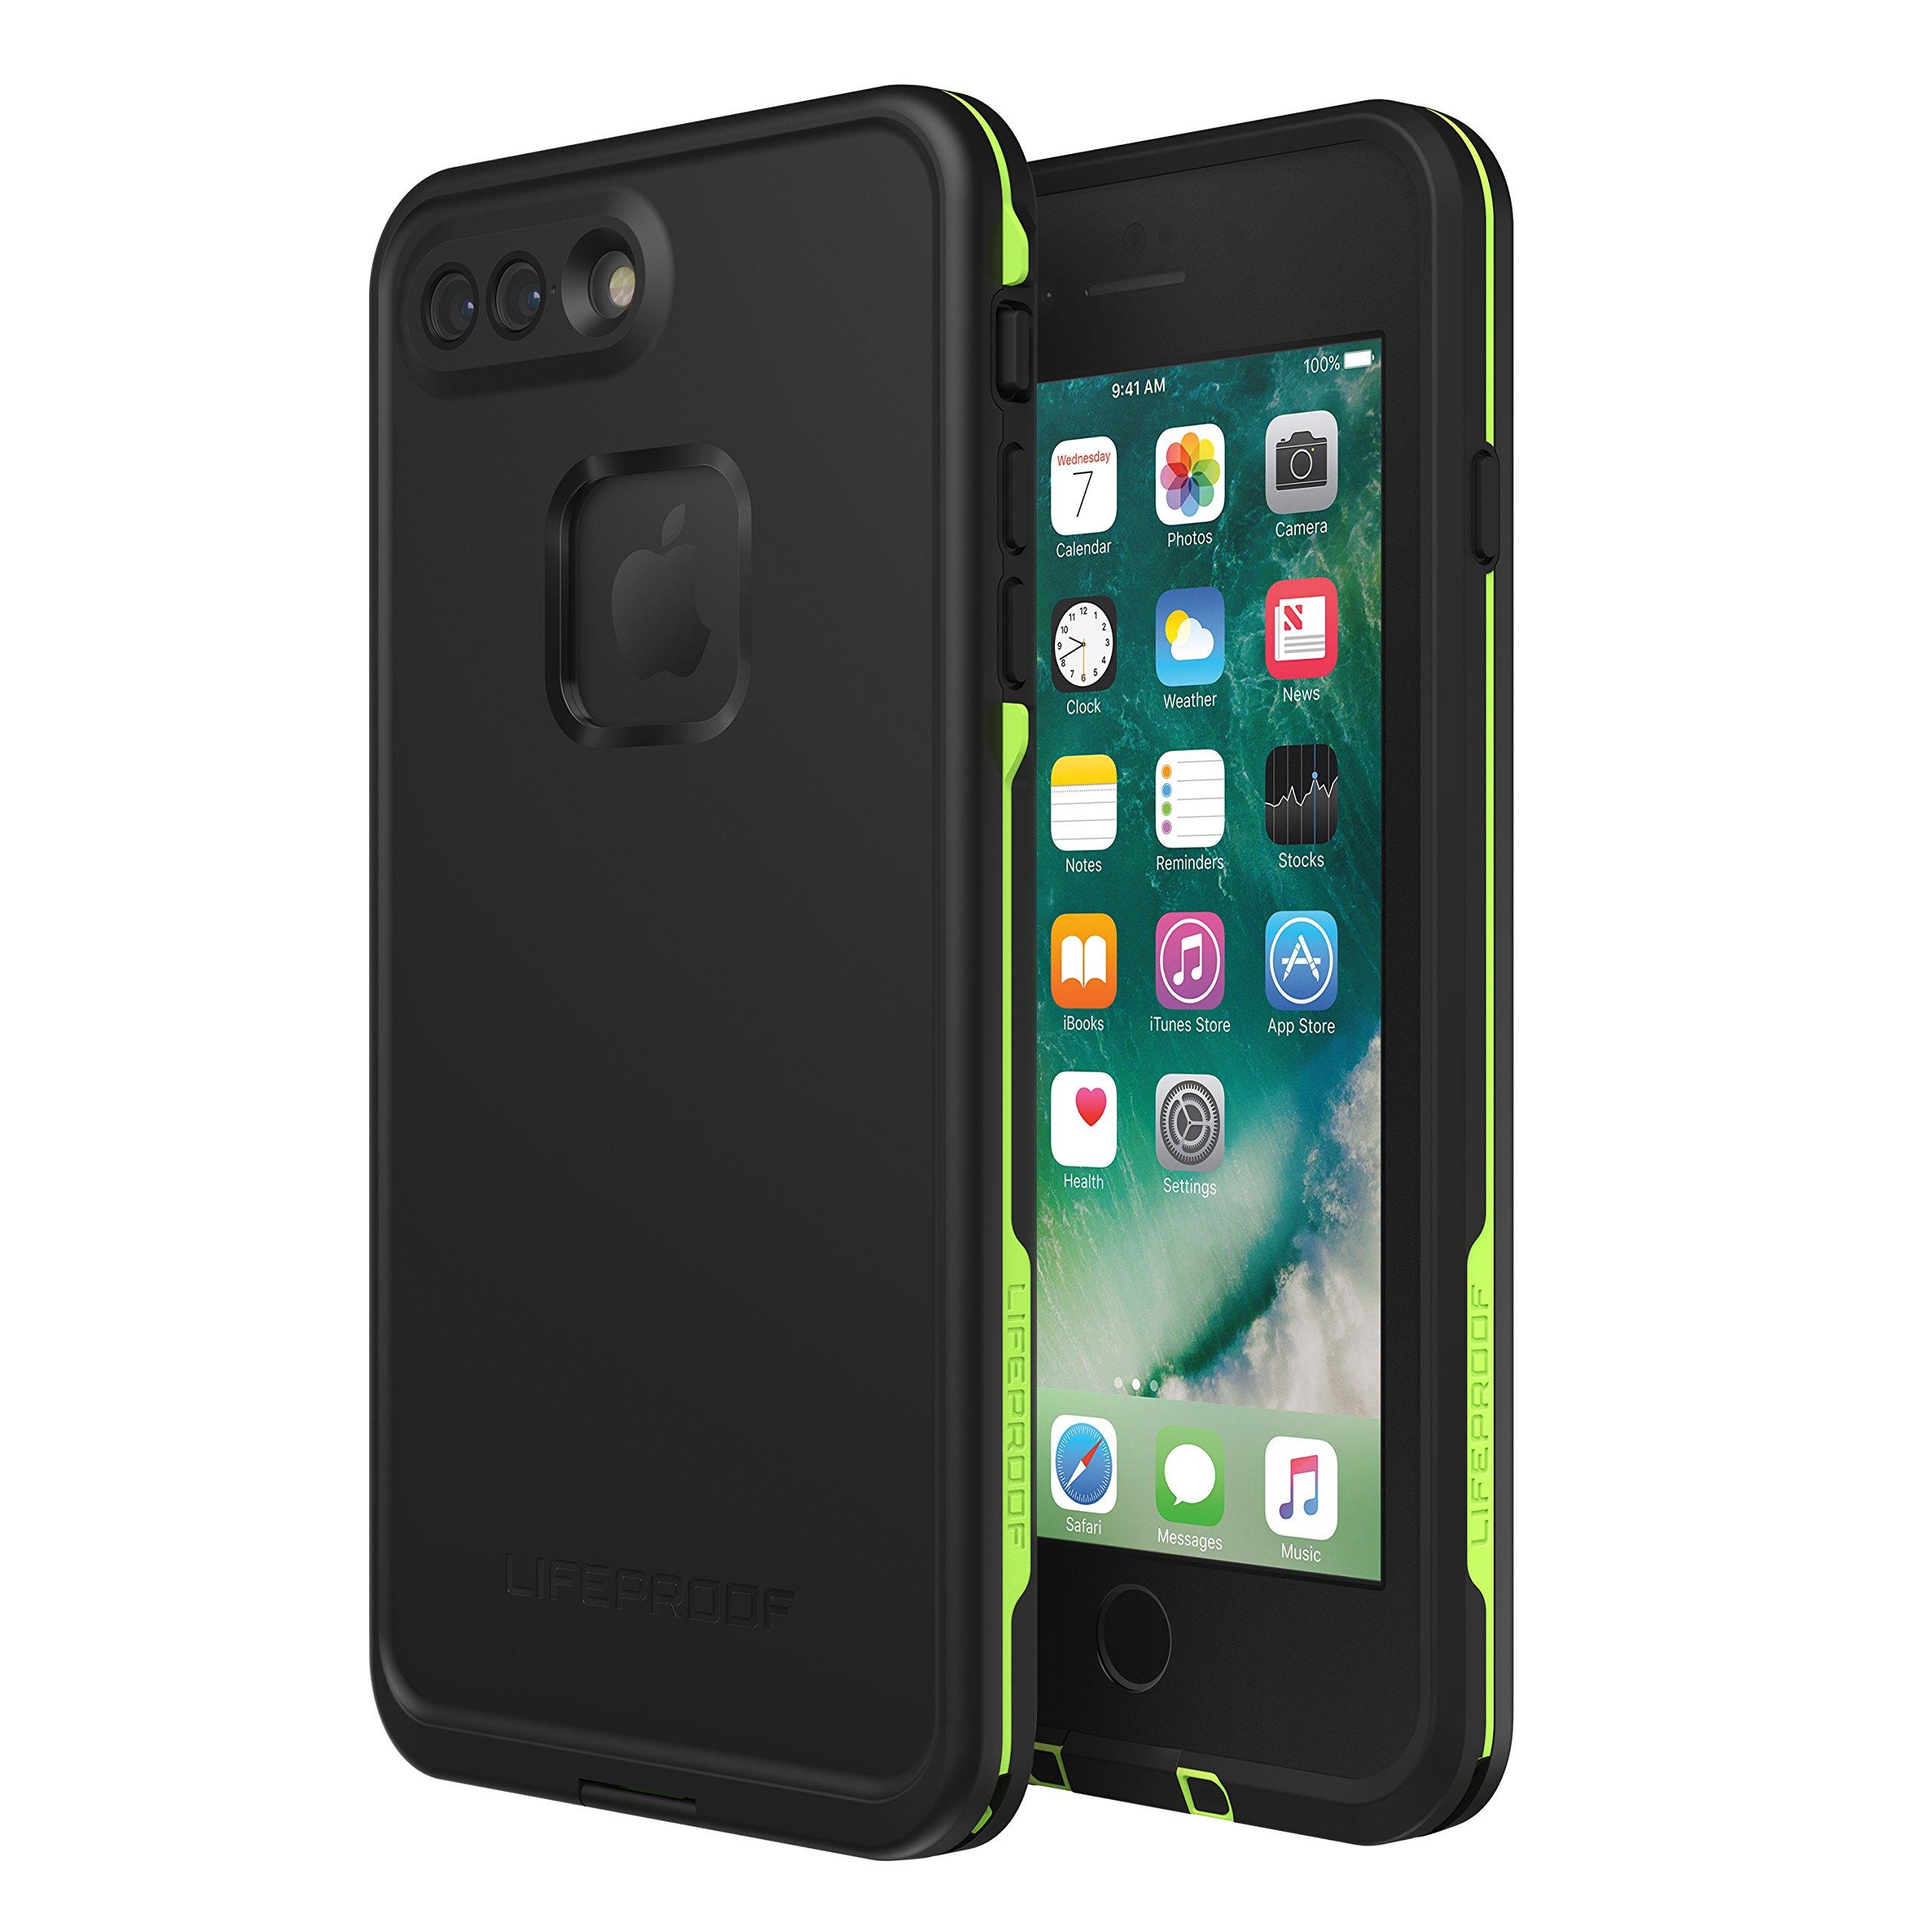 Lifeproof FRĒ SERIES Waterproof Case for iPhone 8 Plus & 7 Plus (ONLY) - Retail Packaging - NIGHT LITE (BLACK/LIME) by LifeProof